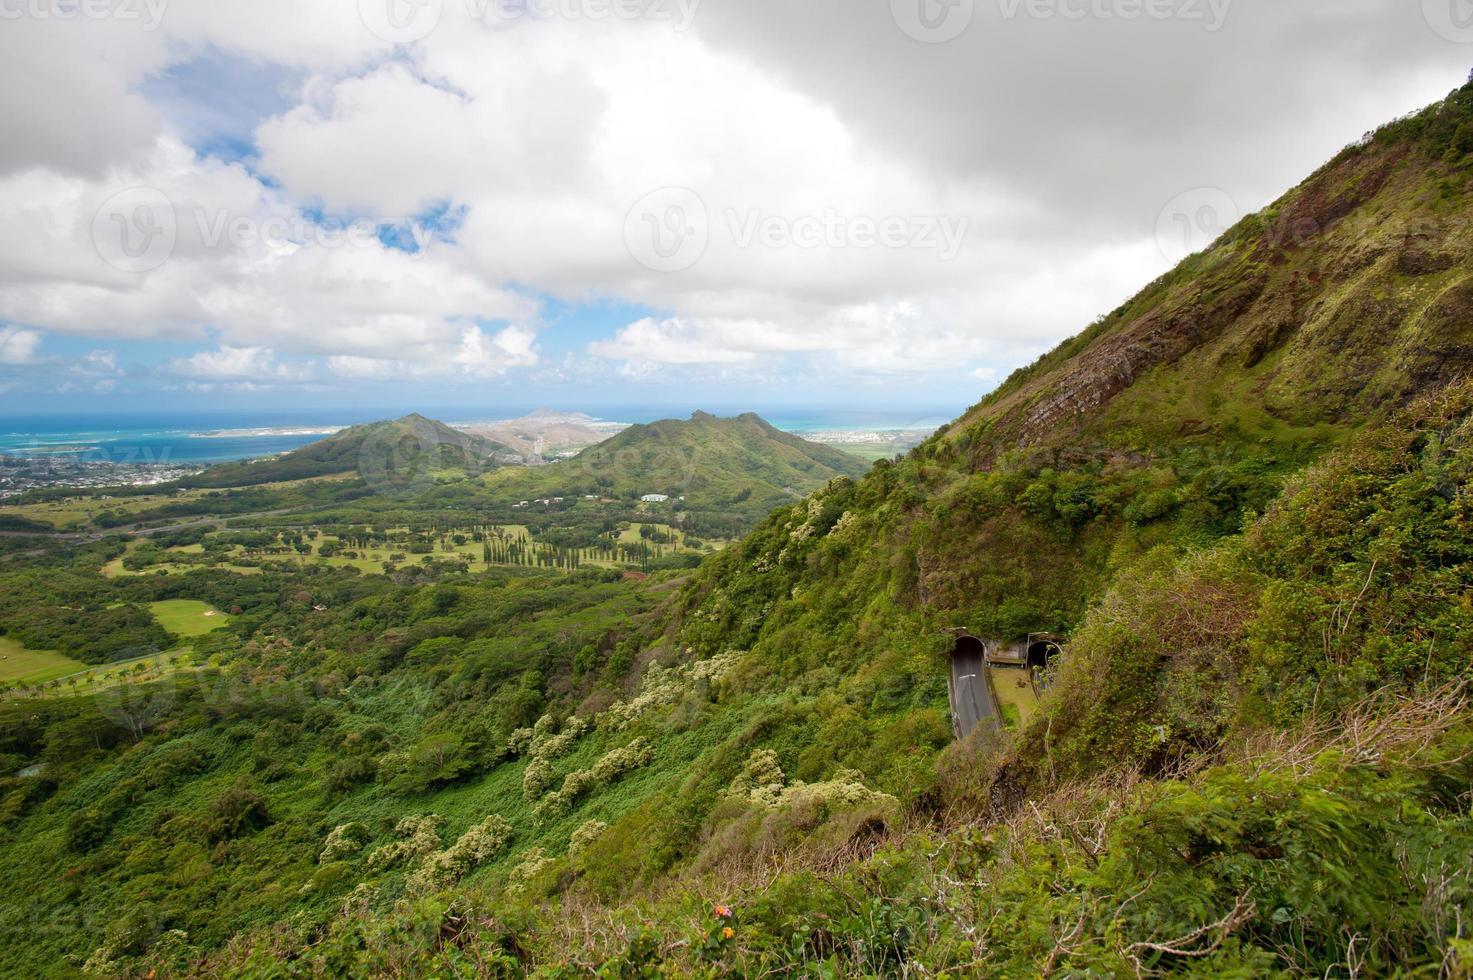 vista de oahu do mirante pali. foto